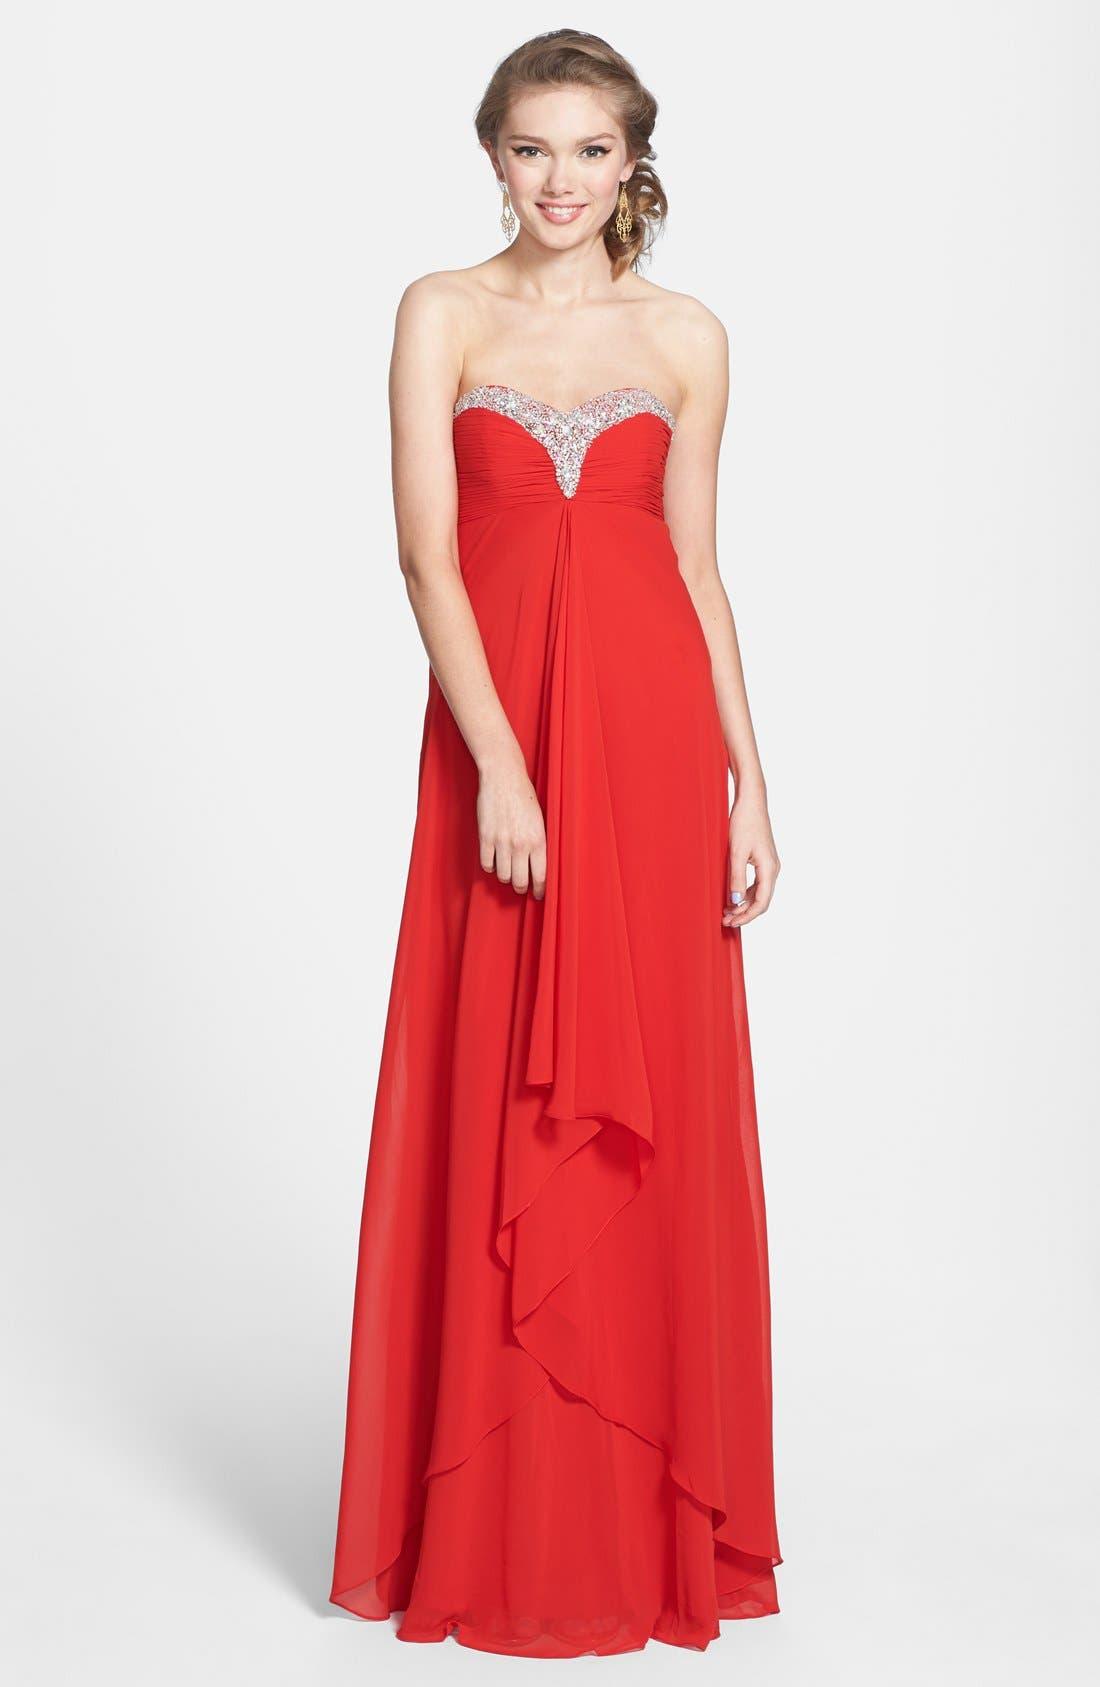 Main Image - Faviana Jeweled Layered Chiffon Gown (Online Exclusive)